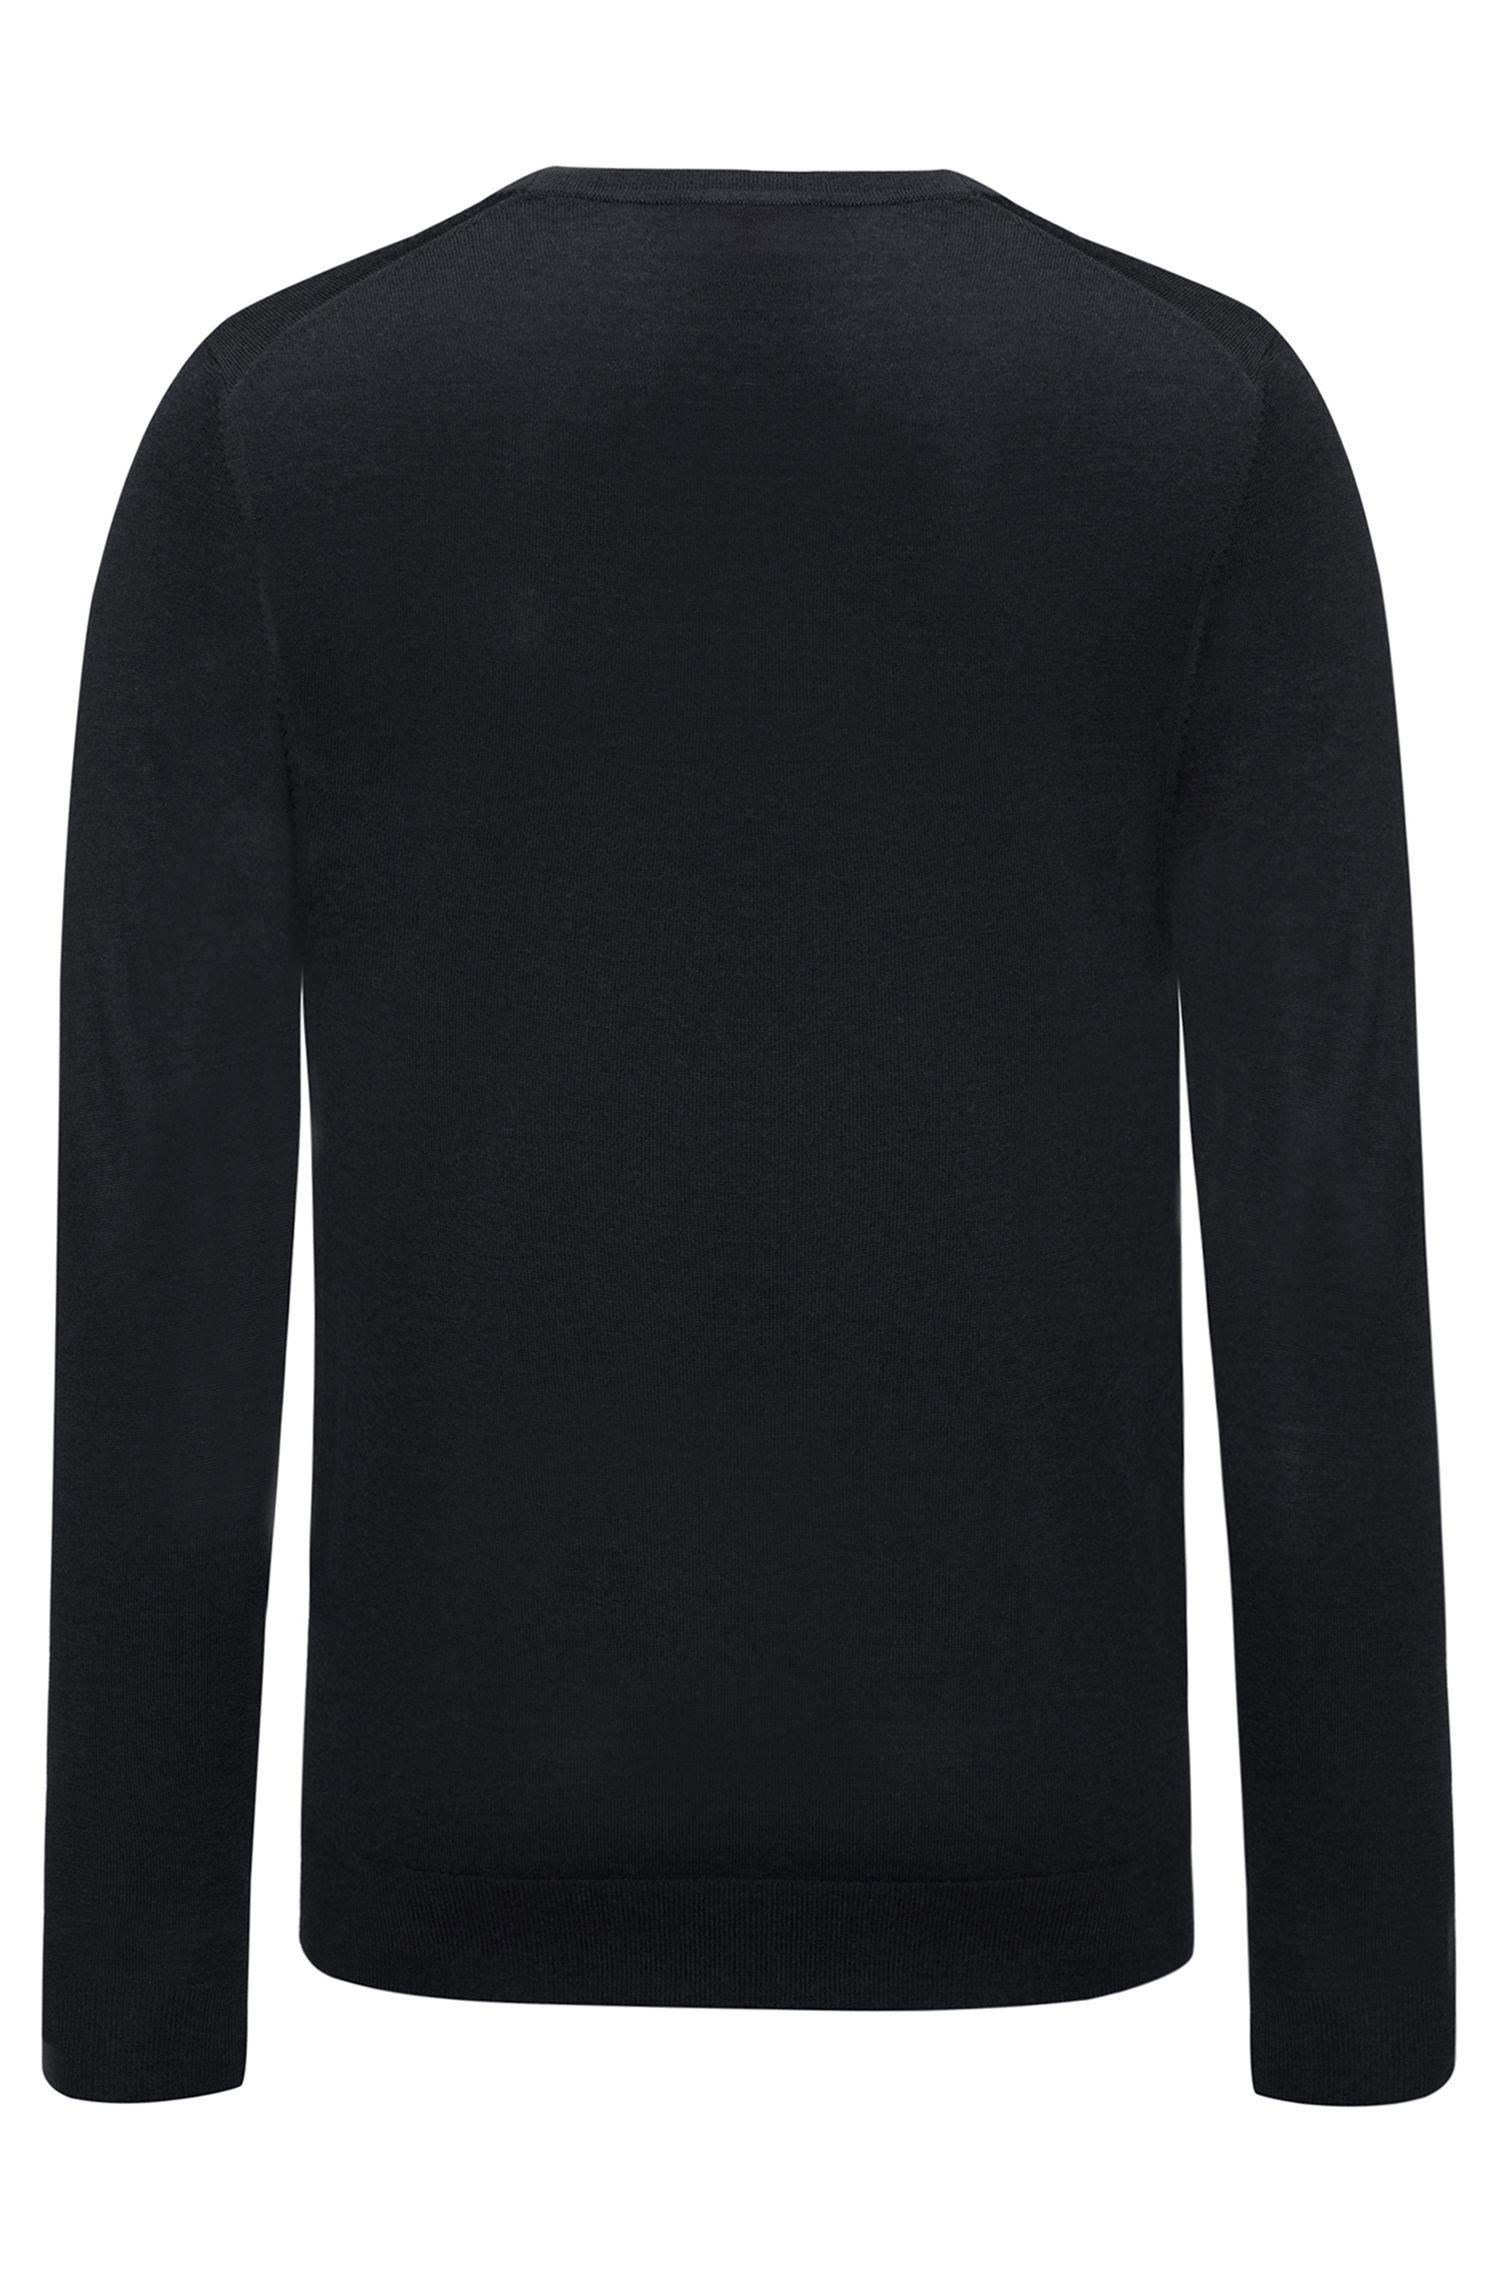 Unifarbener Slim-Fit Pullover aus Schurwoll-Mix: 'San Carlo'